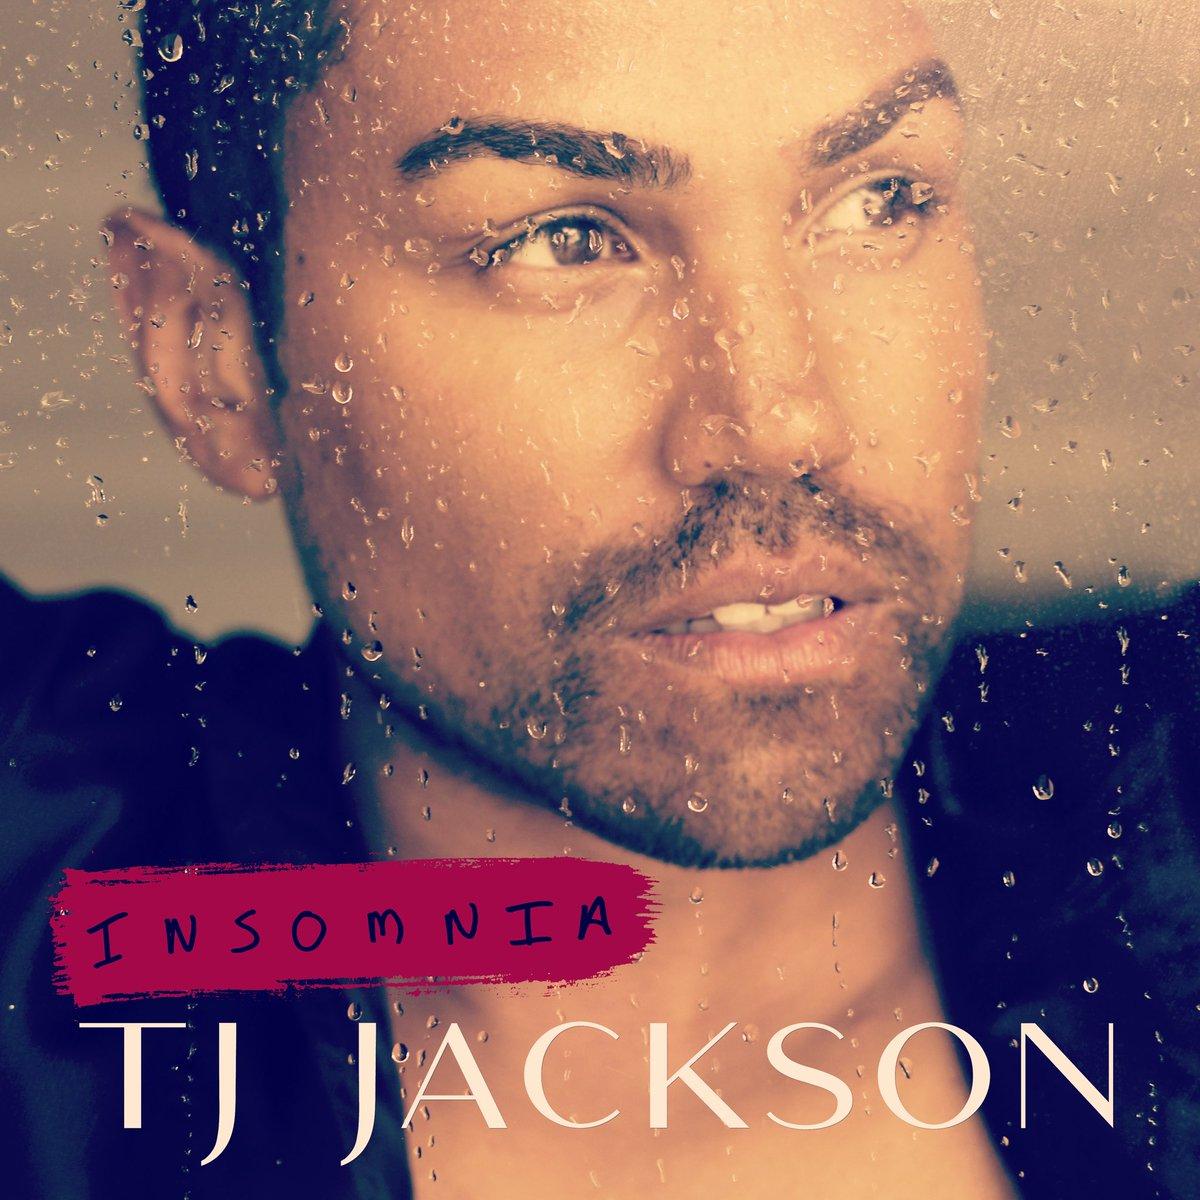 TJ Jackson Nephew of Michael Jackson Drops New Single 'Insomnia'